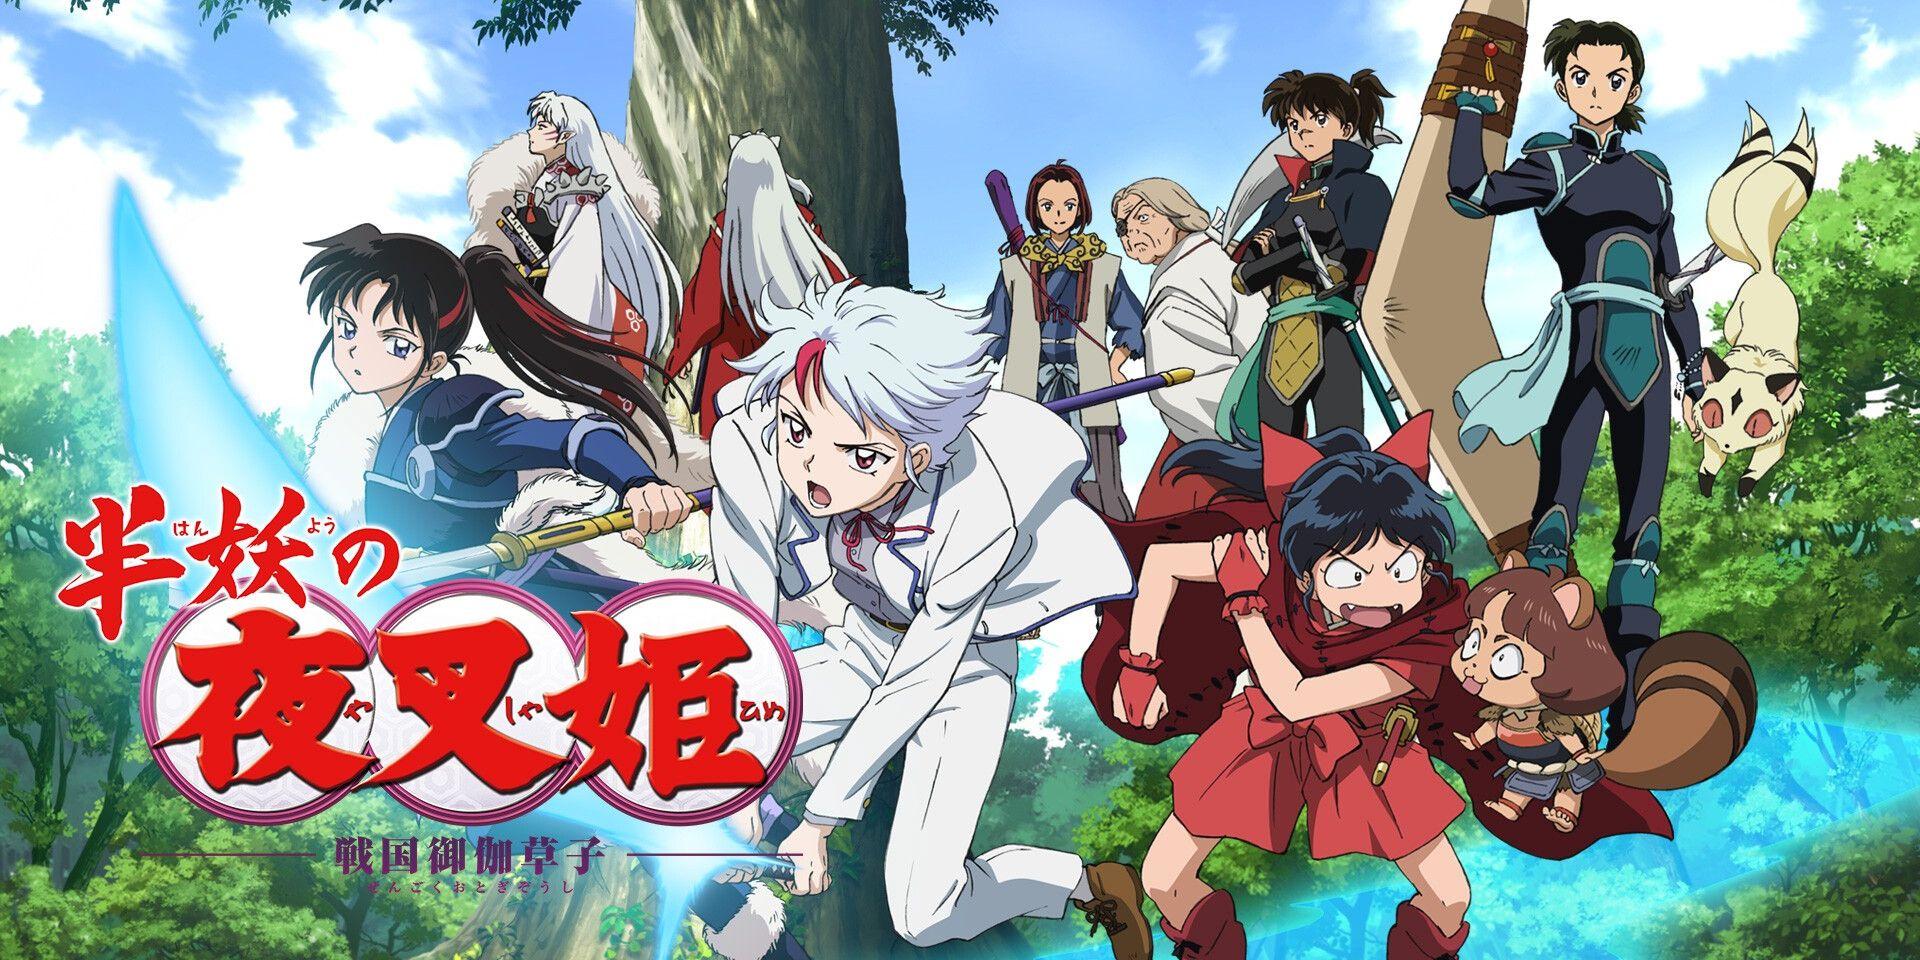 Inuyasha full episodes dubbed online, free subbed